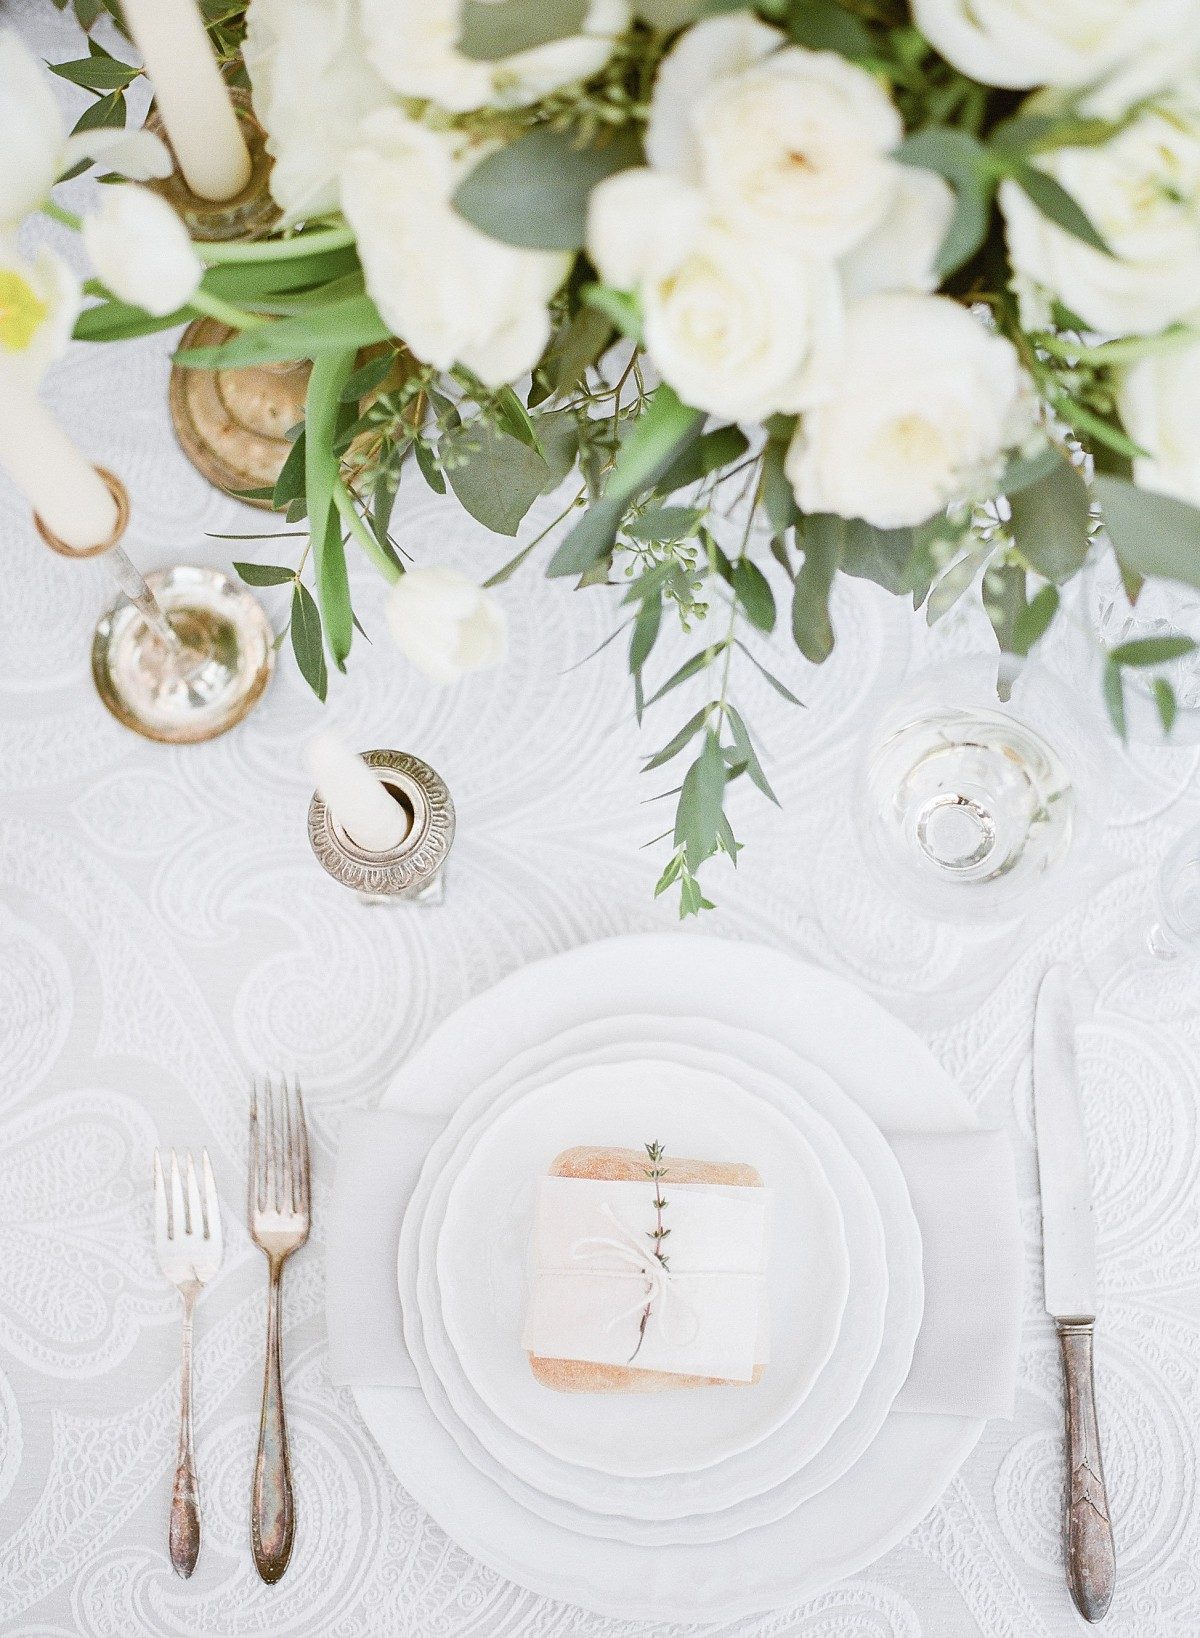 Romantic Wedding Ideas with Eucalyptus Garland